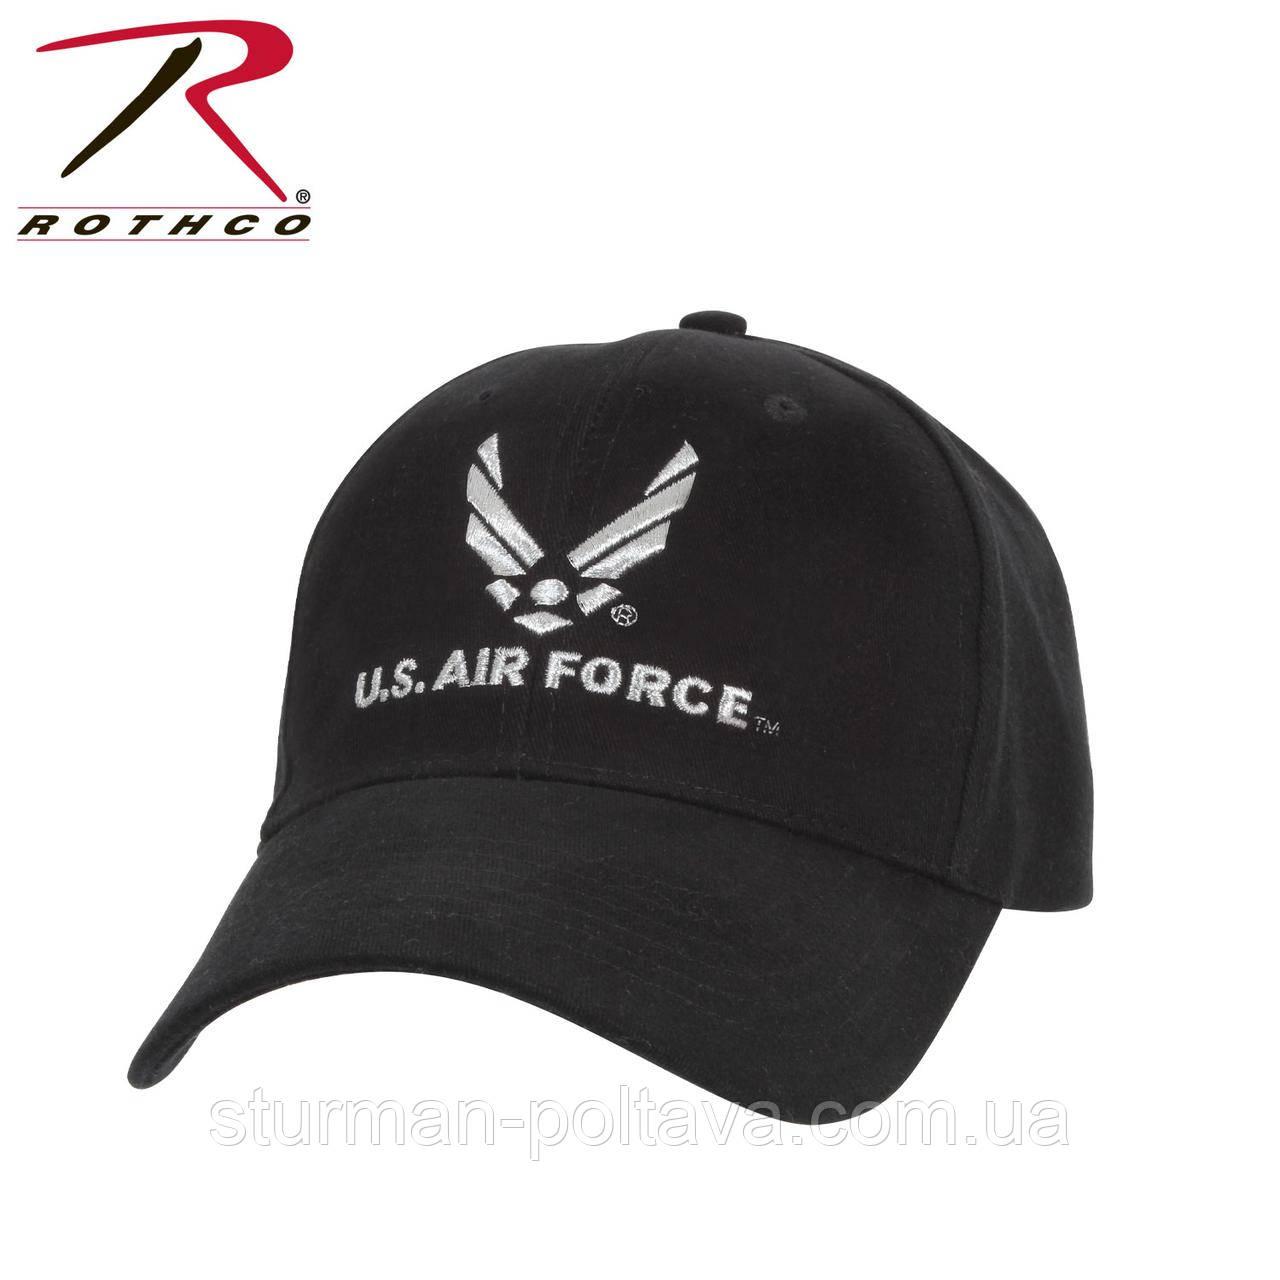 Бейсболка мужская ВВС U.S. Air Force Low Profile Cap  USA